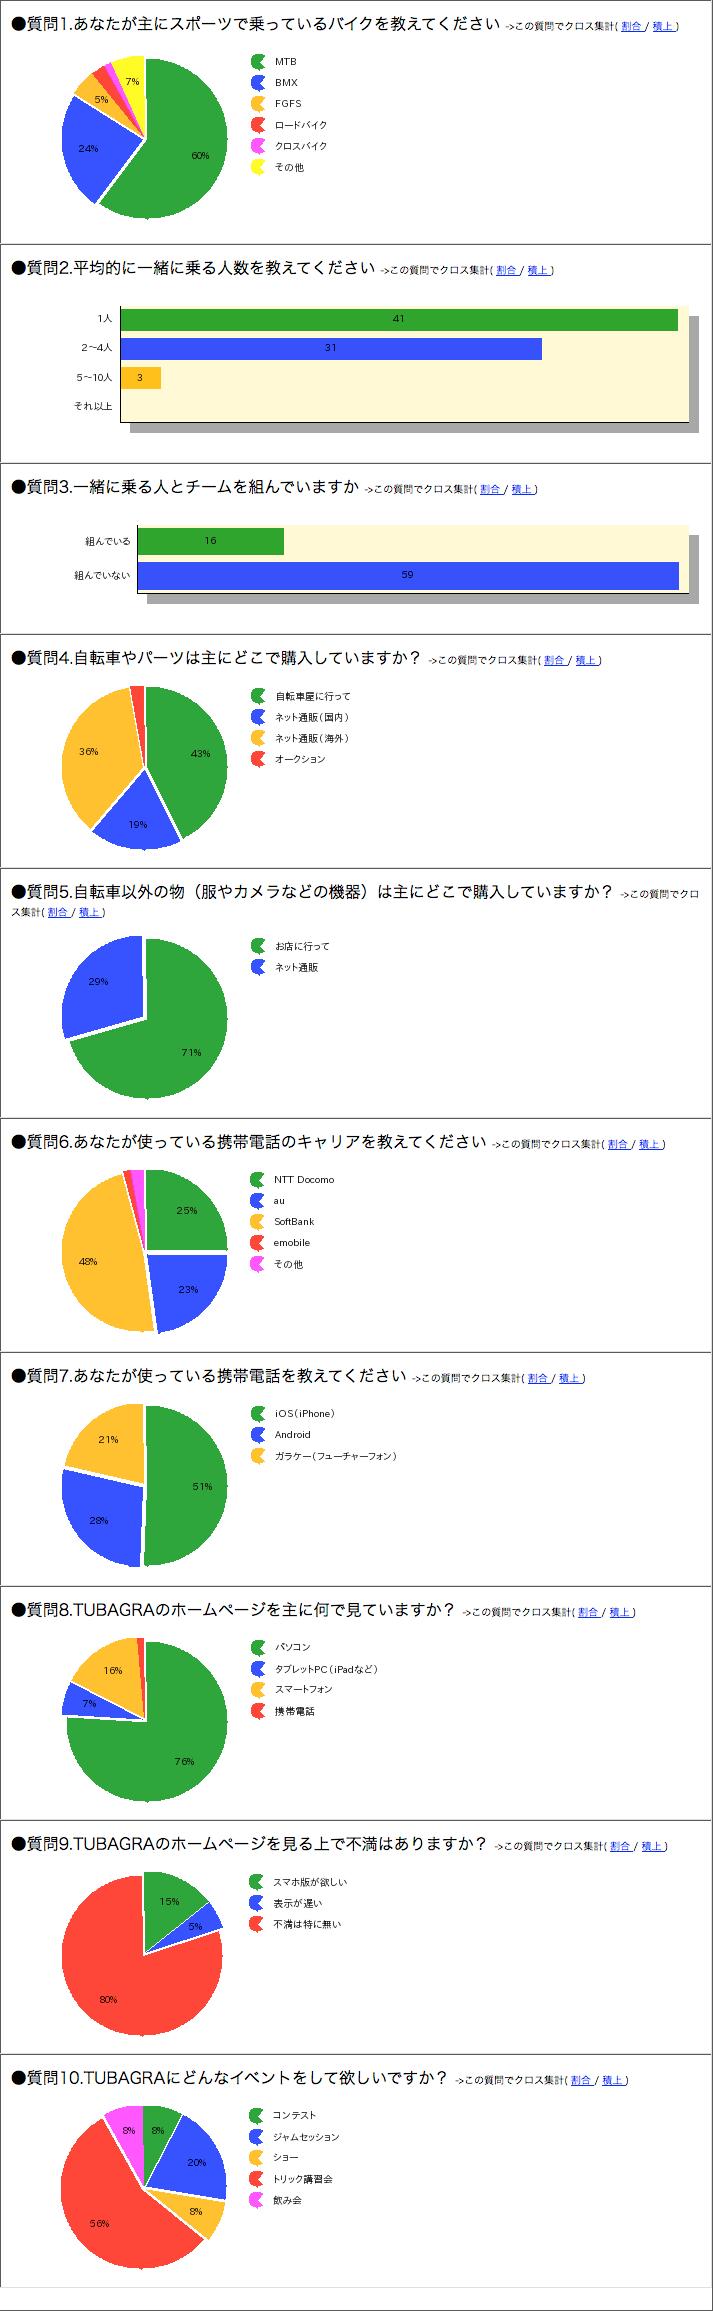 TUBAGRAユーザーズアンケート途中結果